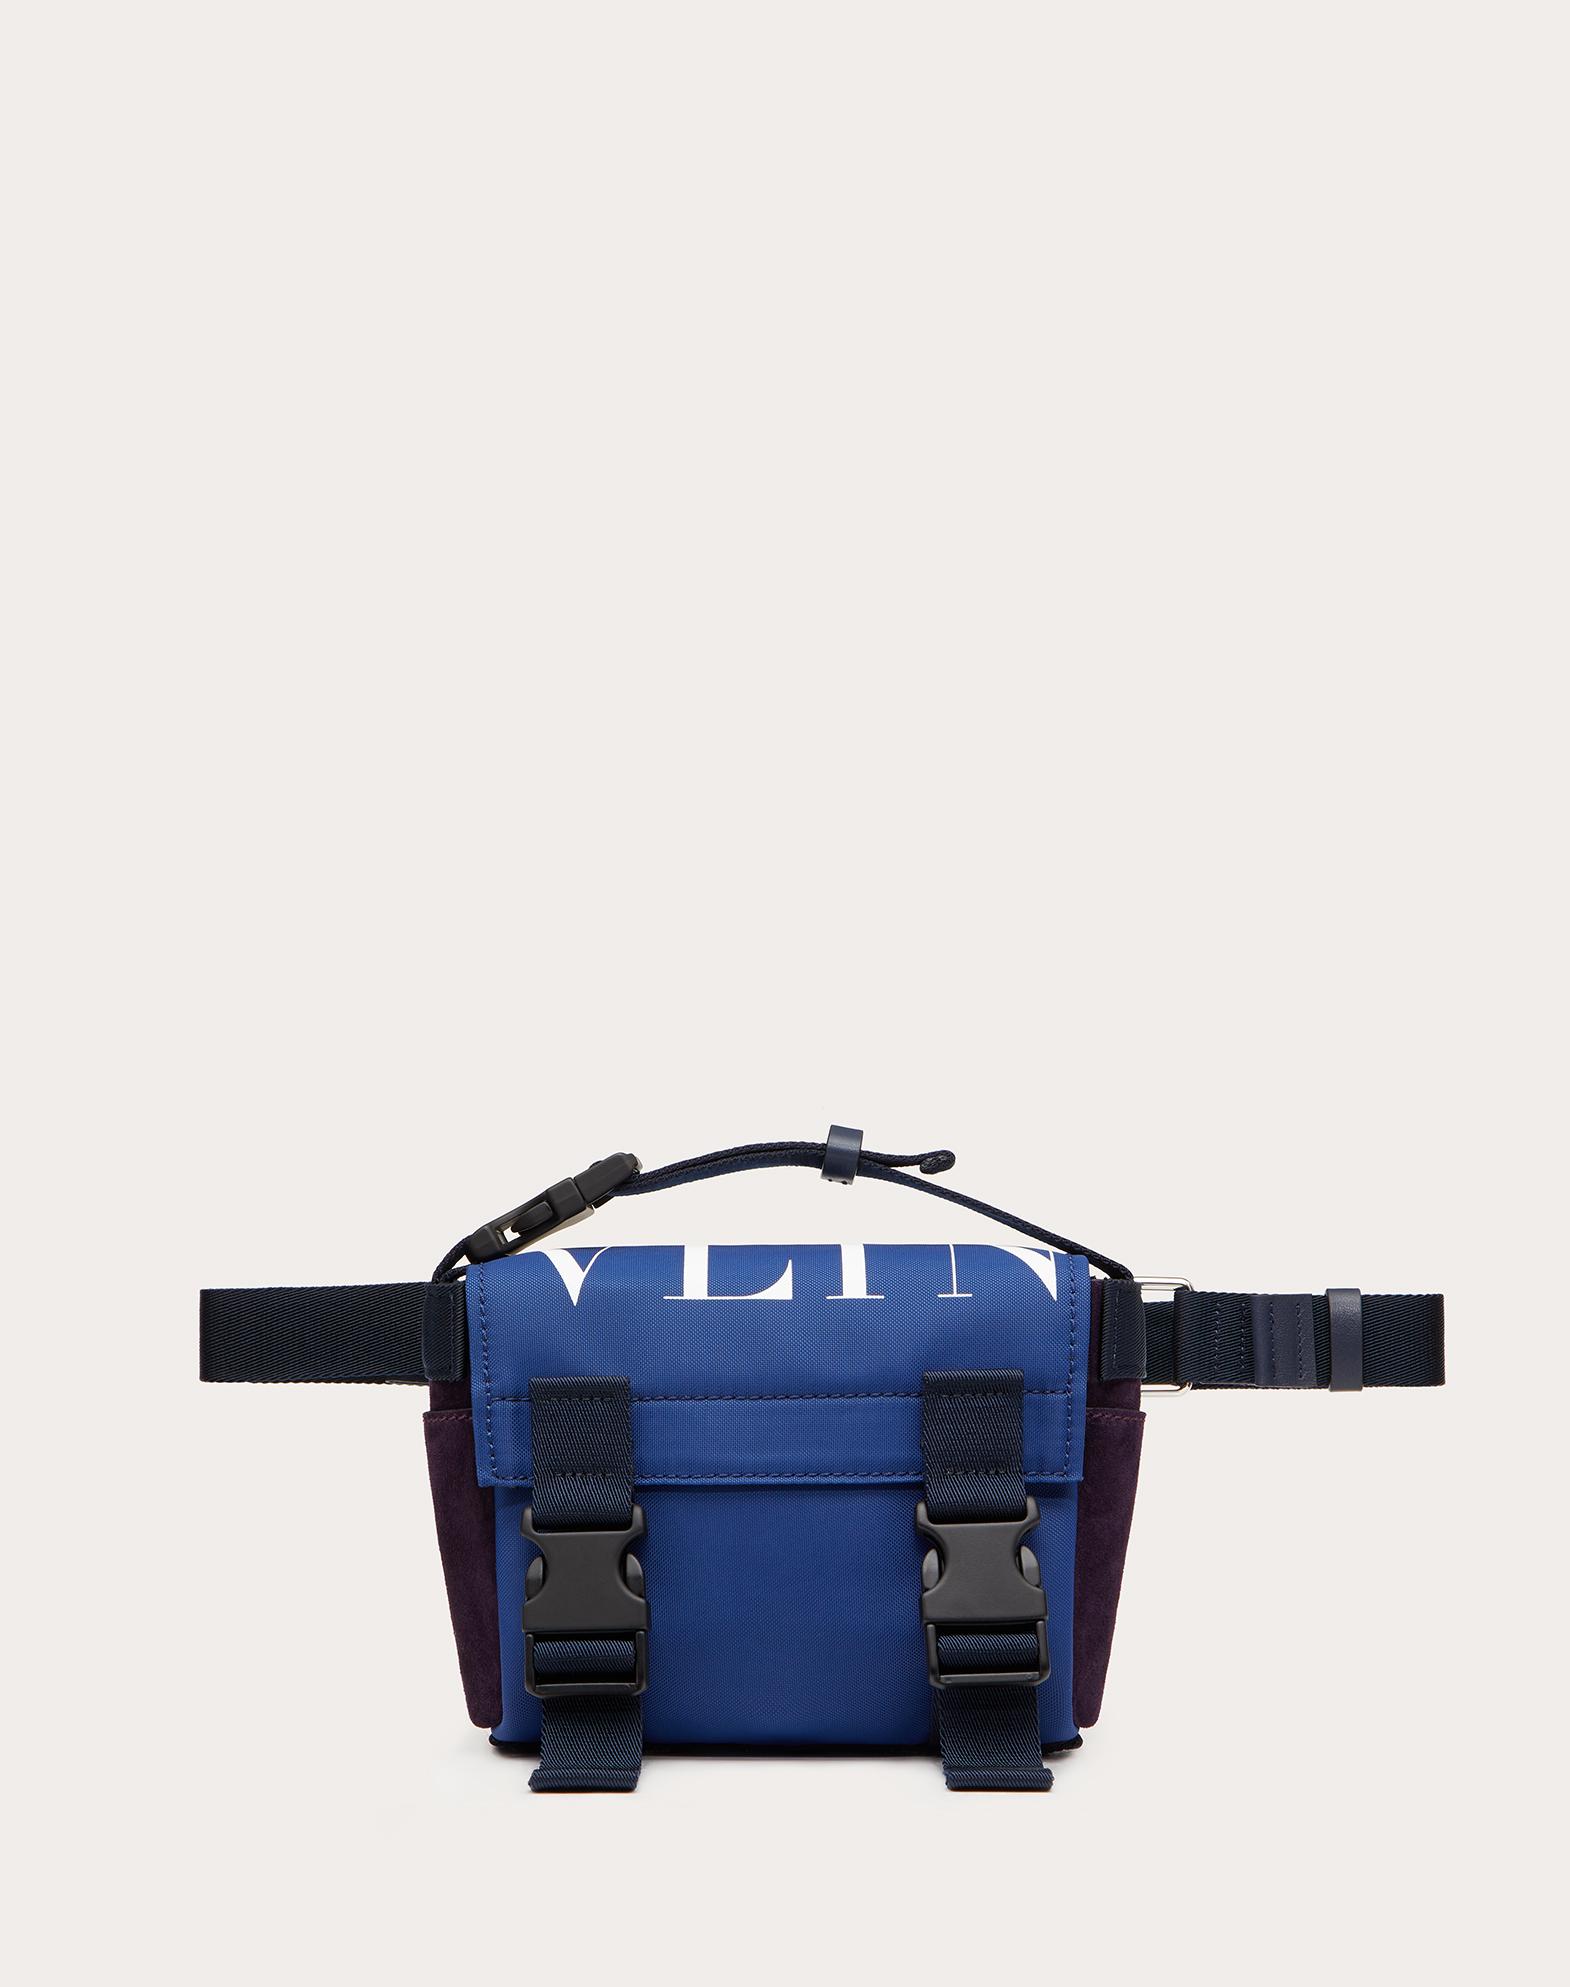 VLTN Nylon and Crust Leather Belt Bag